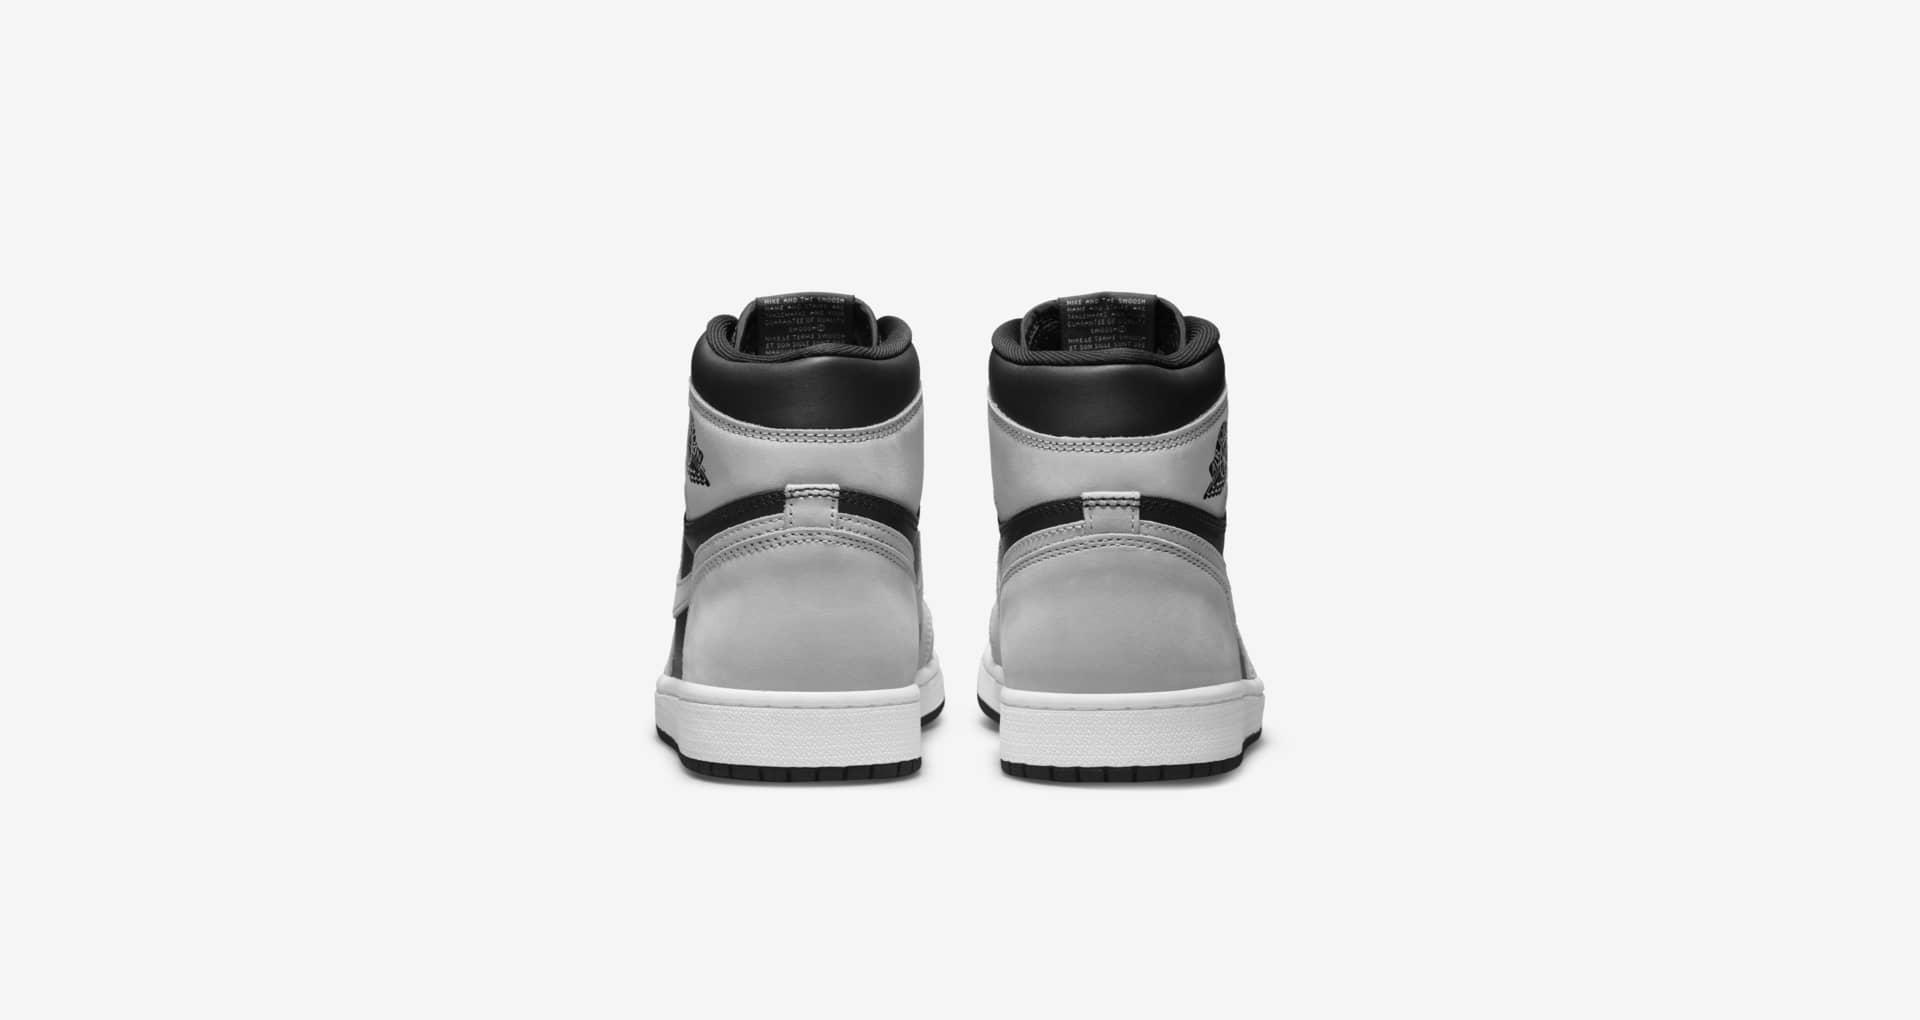 Air Jordan 1 ,AJ1,Shadow 2.0,5  延续经典 Shadow 配色!「影子 2.0」Air Jordan 1 上架 SNKRS!